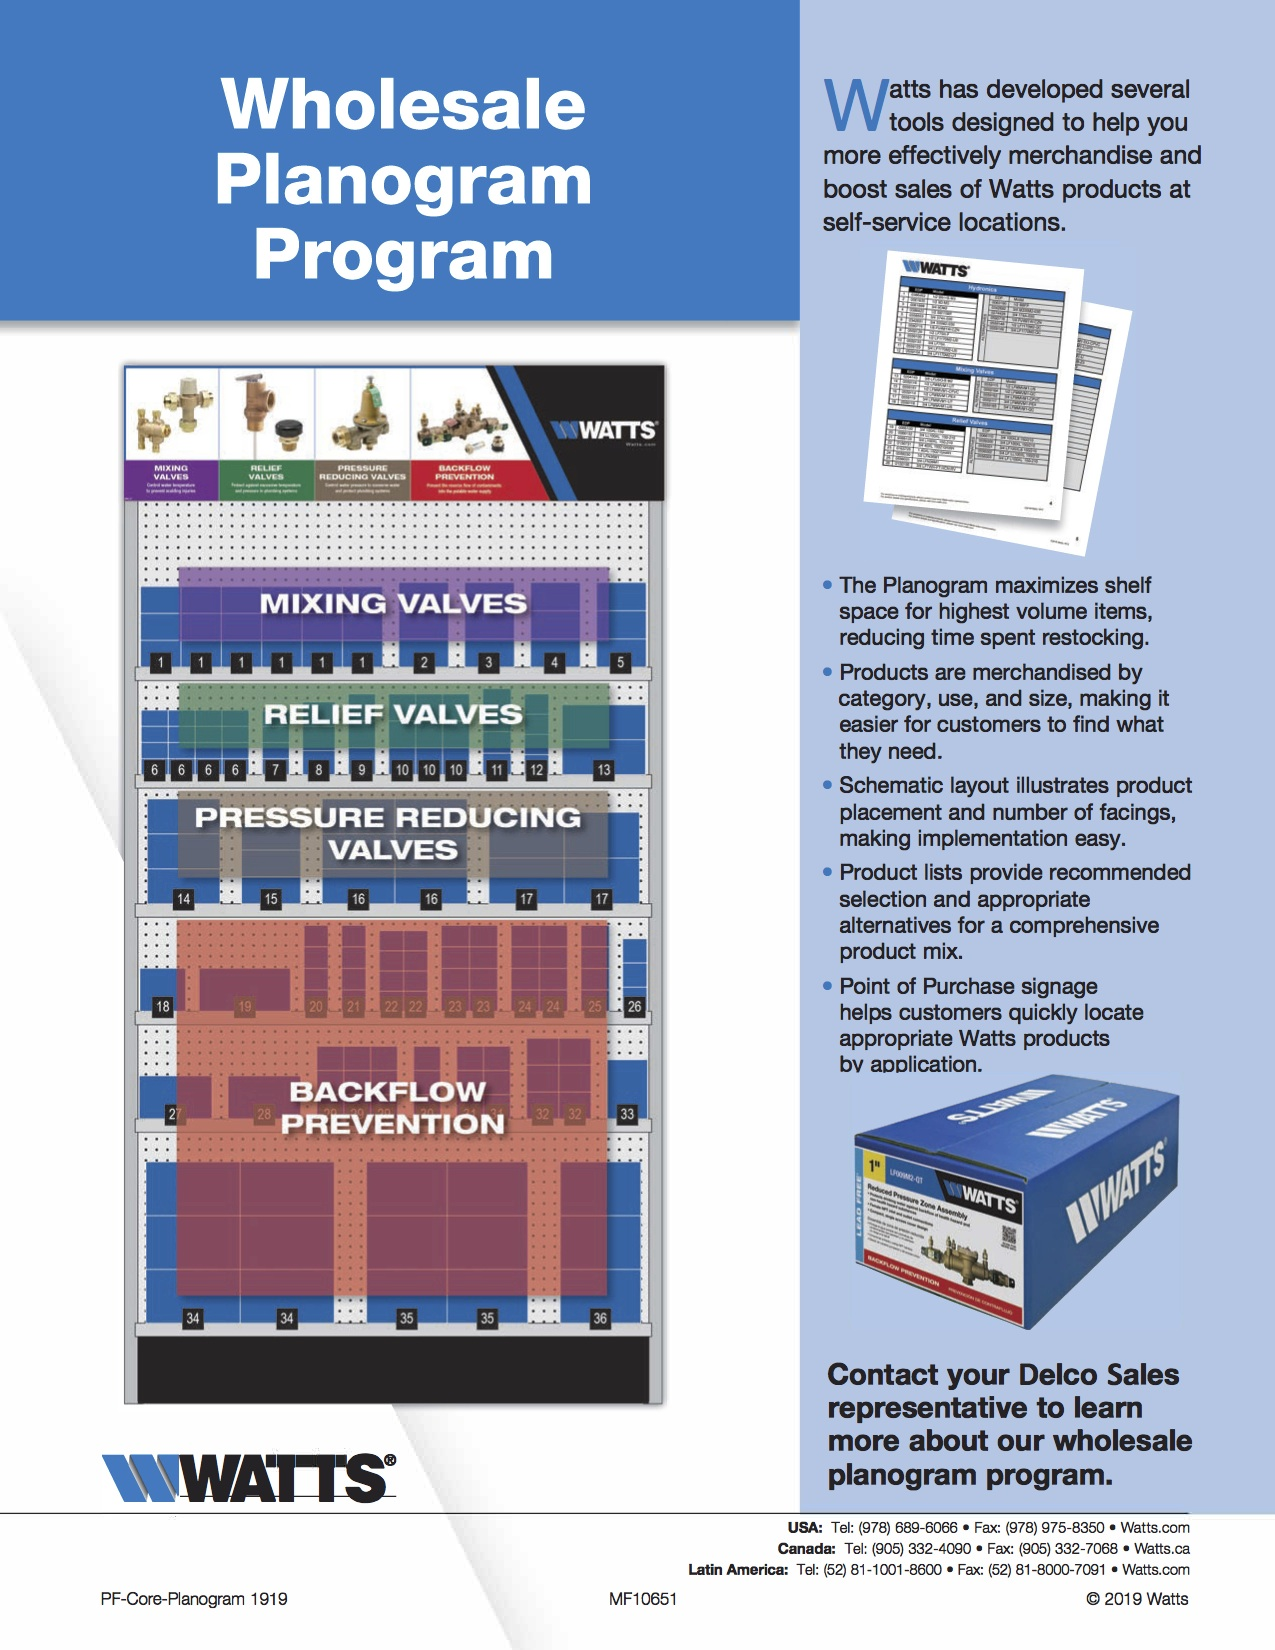 Watts Wholesale Planogram Program Flier - Delco Sales Version.jpg